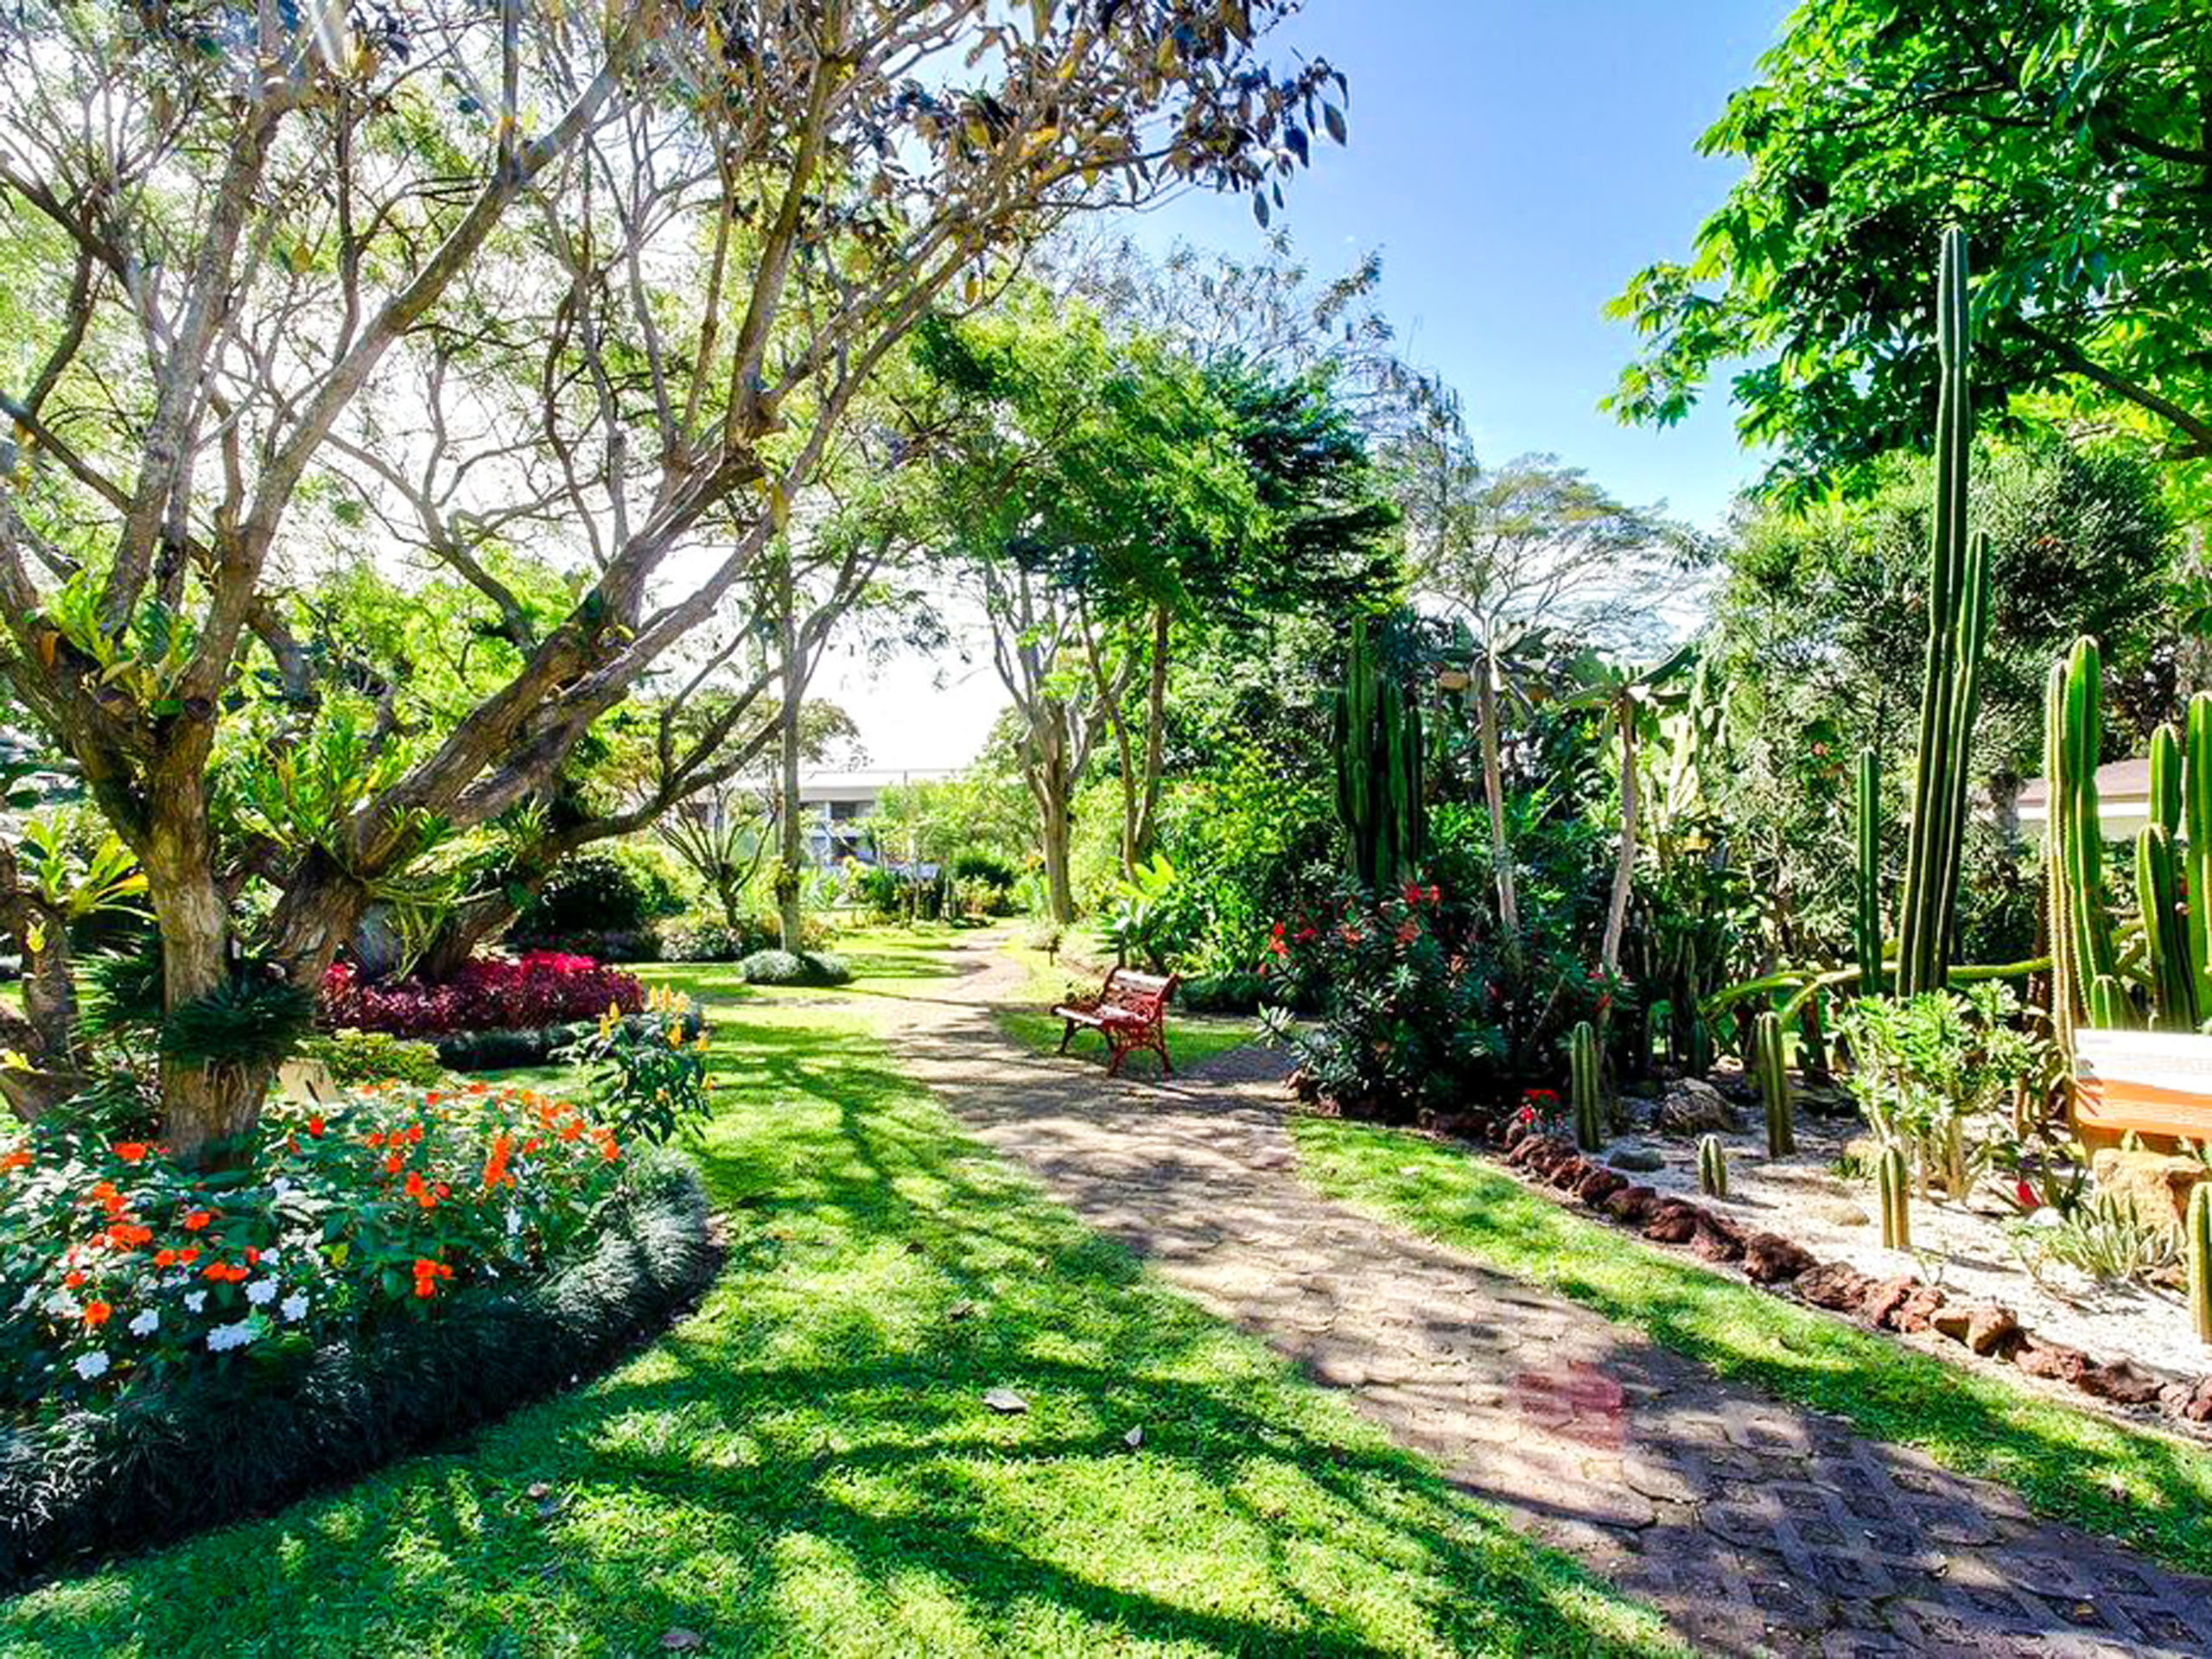 Amazing garden in Bougainvillea Hotel